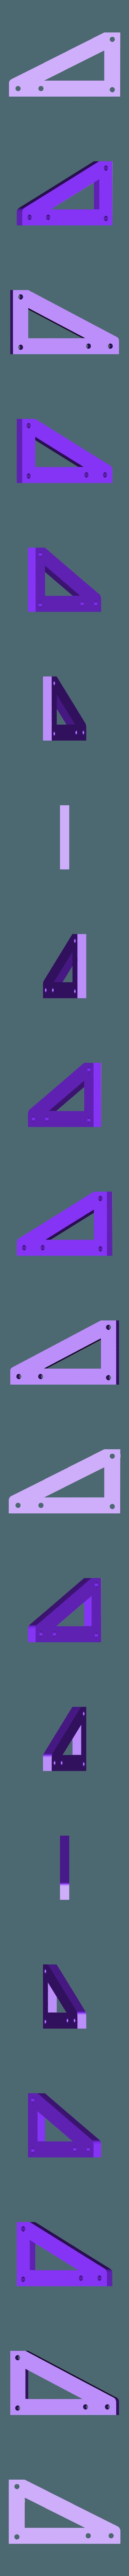 Frame.stl Download free STL file Water Jet for 540 Motors • 3D printable object, SeanTheITGuy